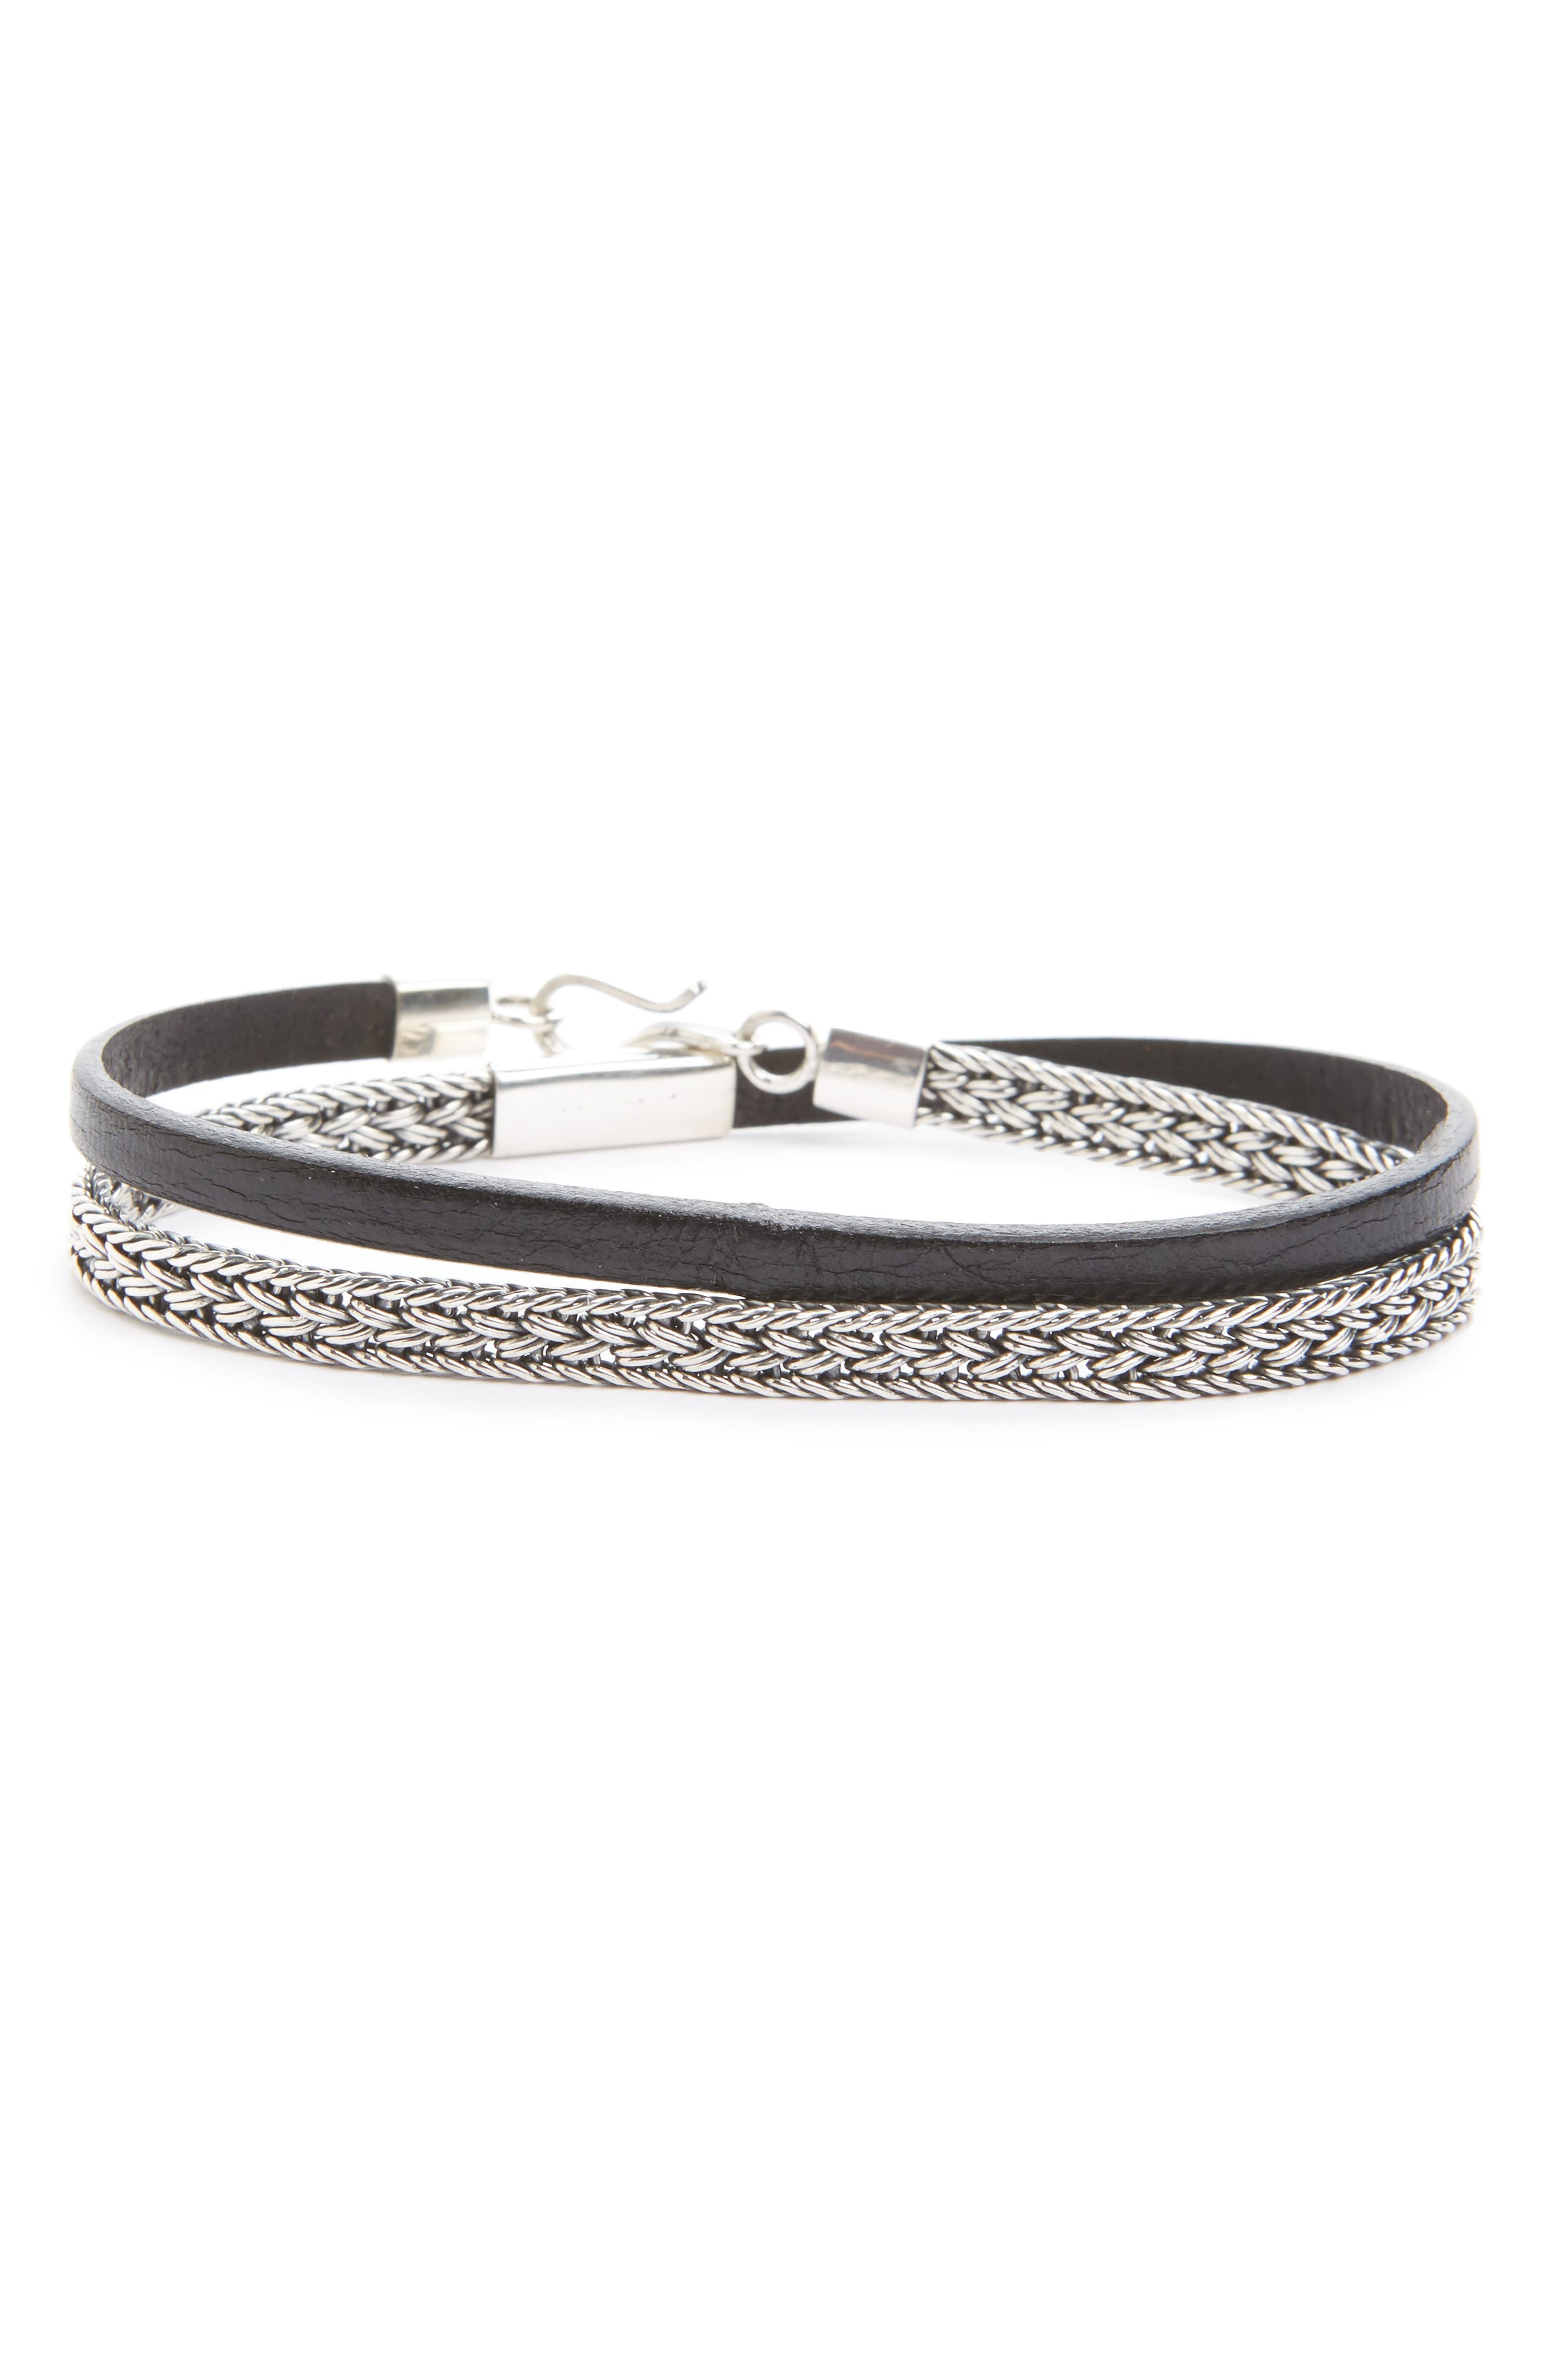 Caputo & Co. Sterling Silver & Leather Wrap Bracelet